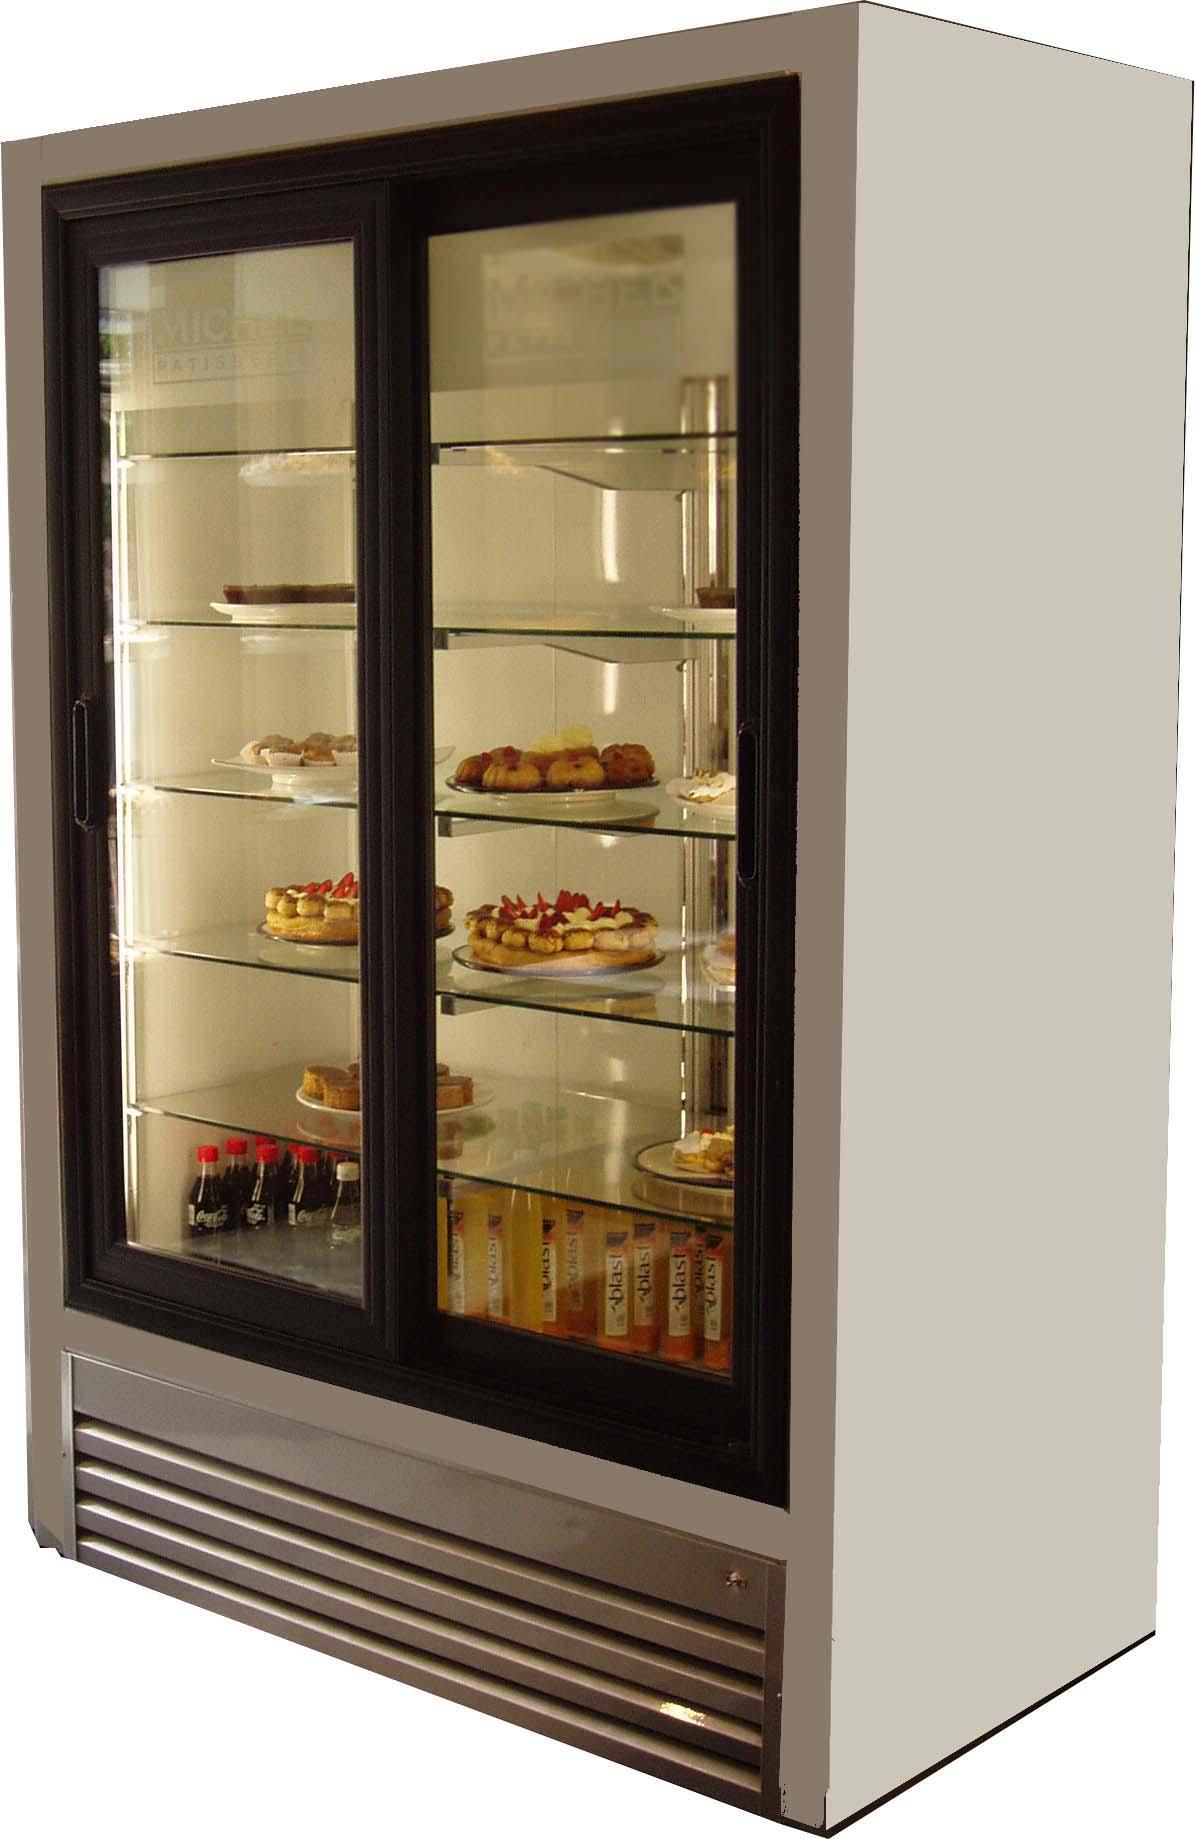 Alquiler de equipos de refrigeracion for Alquiler de equipos de aire acondicionado